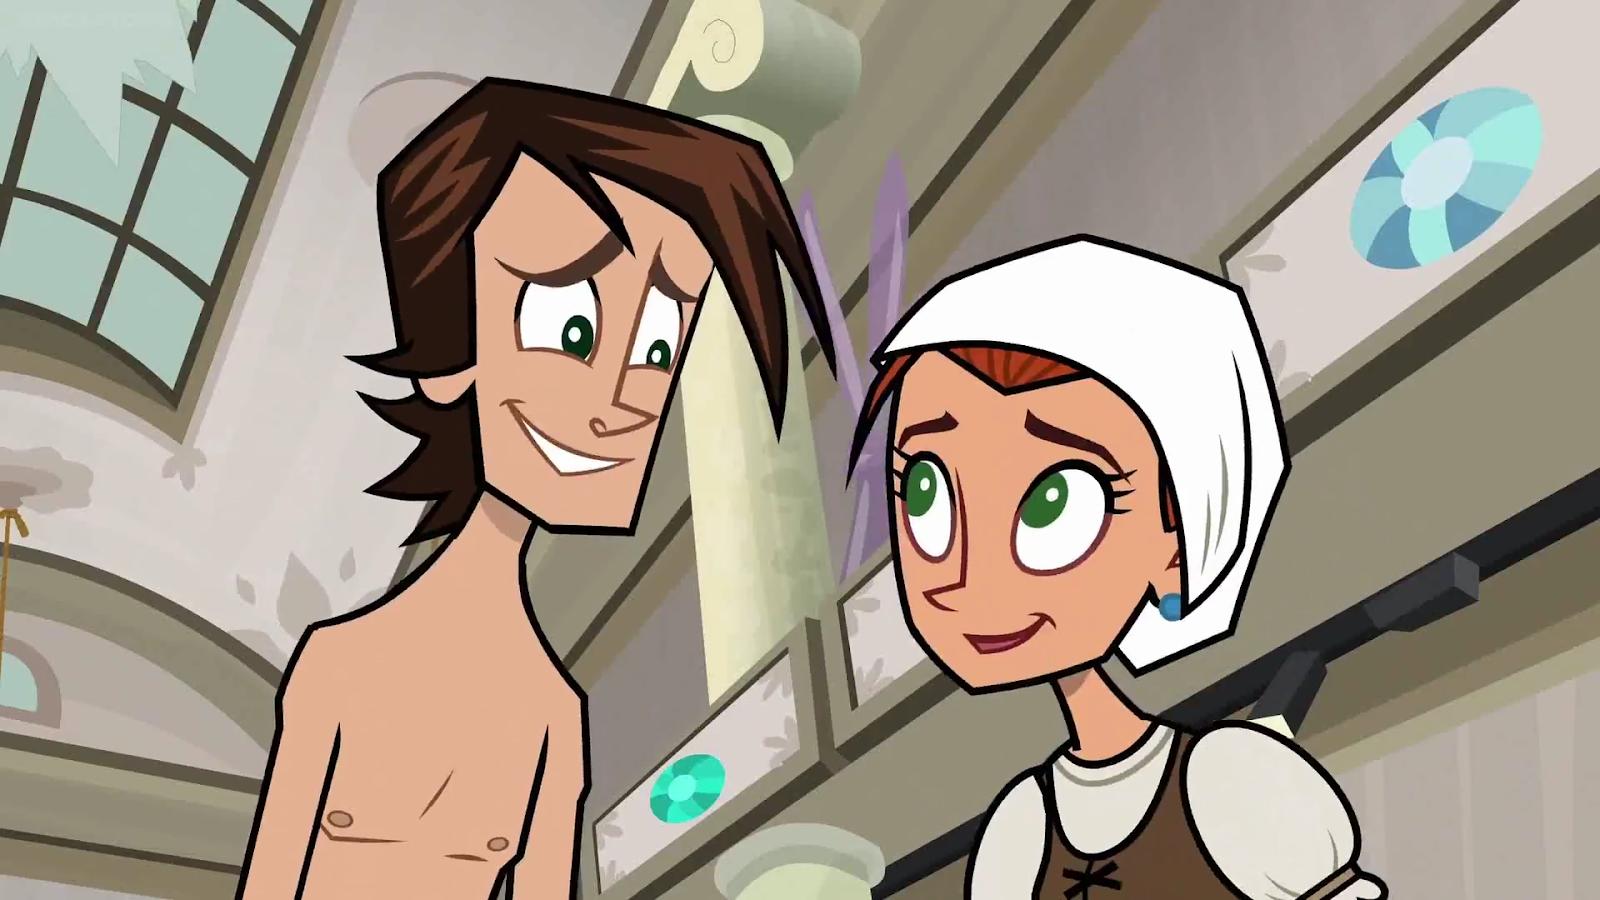 Cartoon Shirtless Boys: Zeke in his underwear